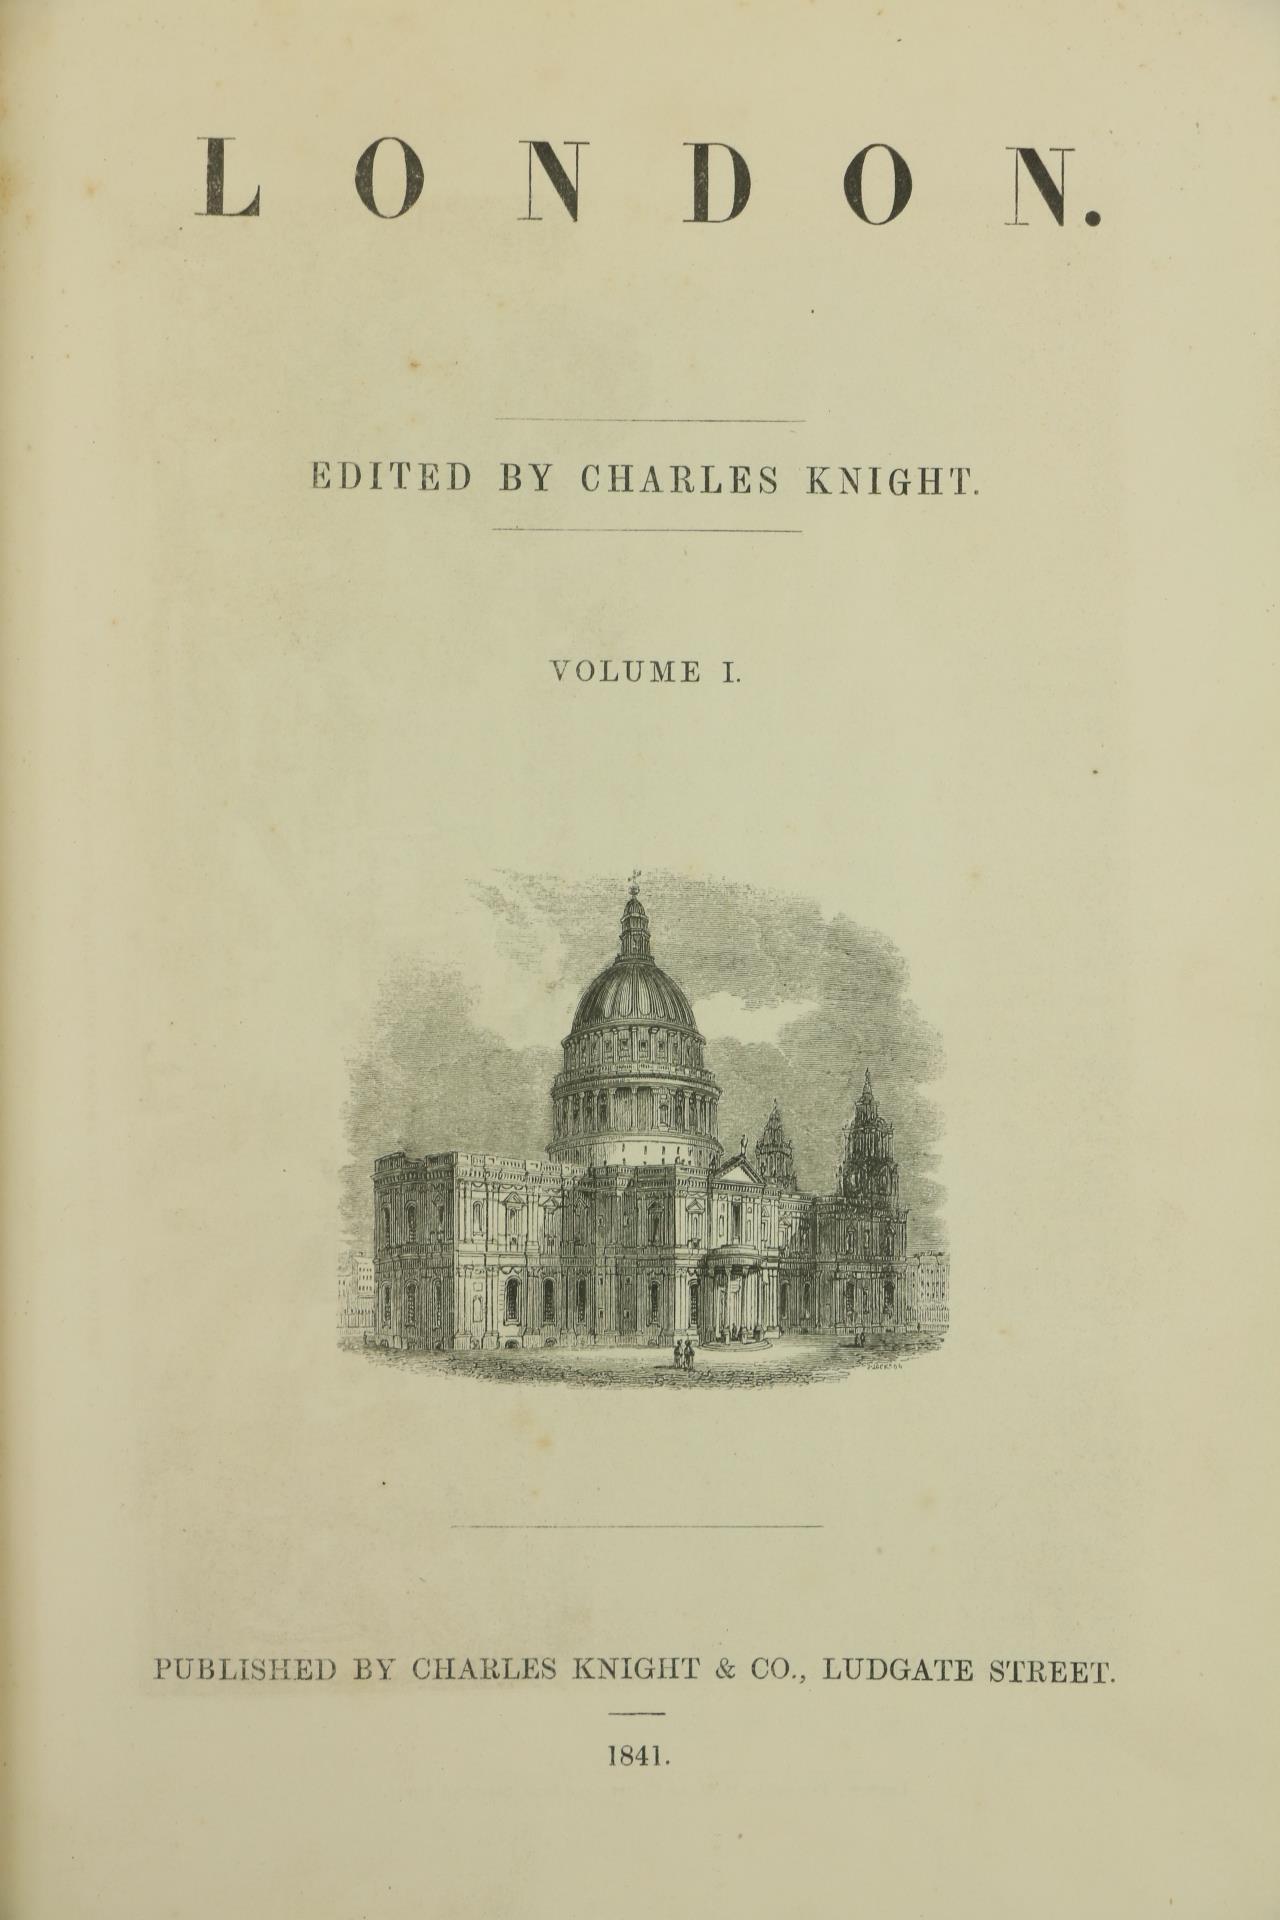 Knight (Chas.)ed.ÿLondon, 6 vols. sm. folio London 1841 - 1844. Illus. thro.-out, cont. hf. calf - Image 2 of 3